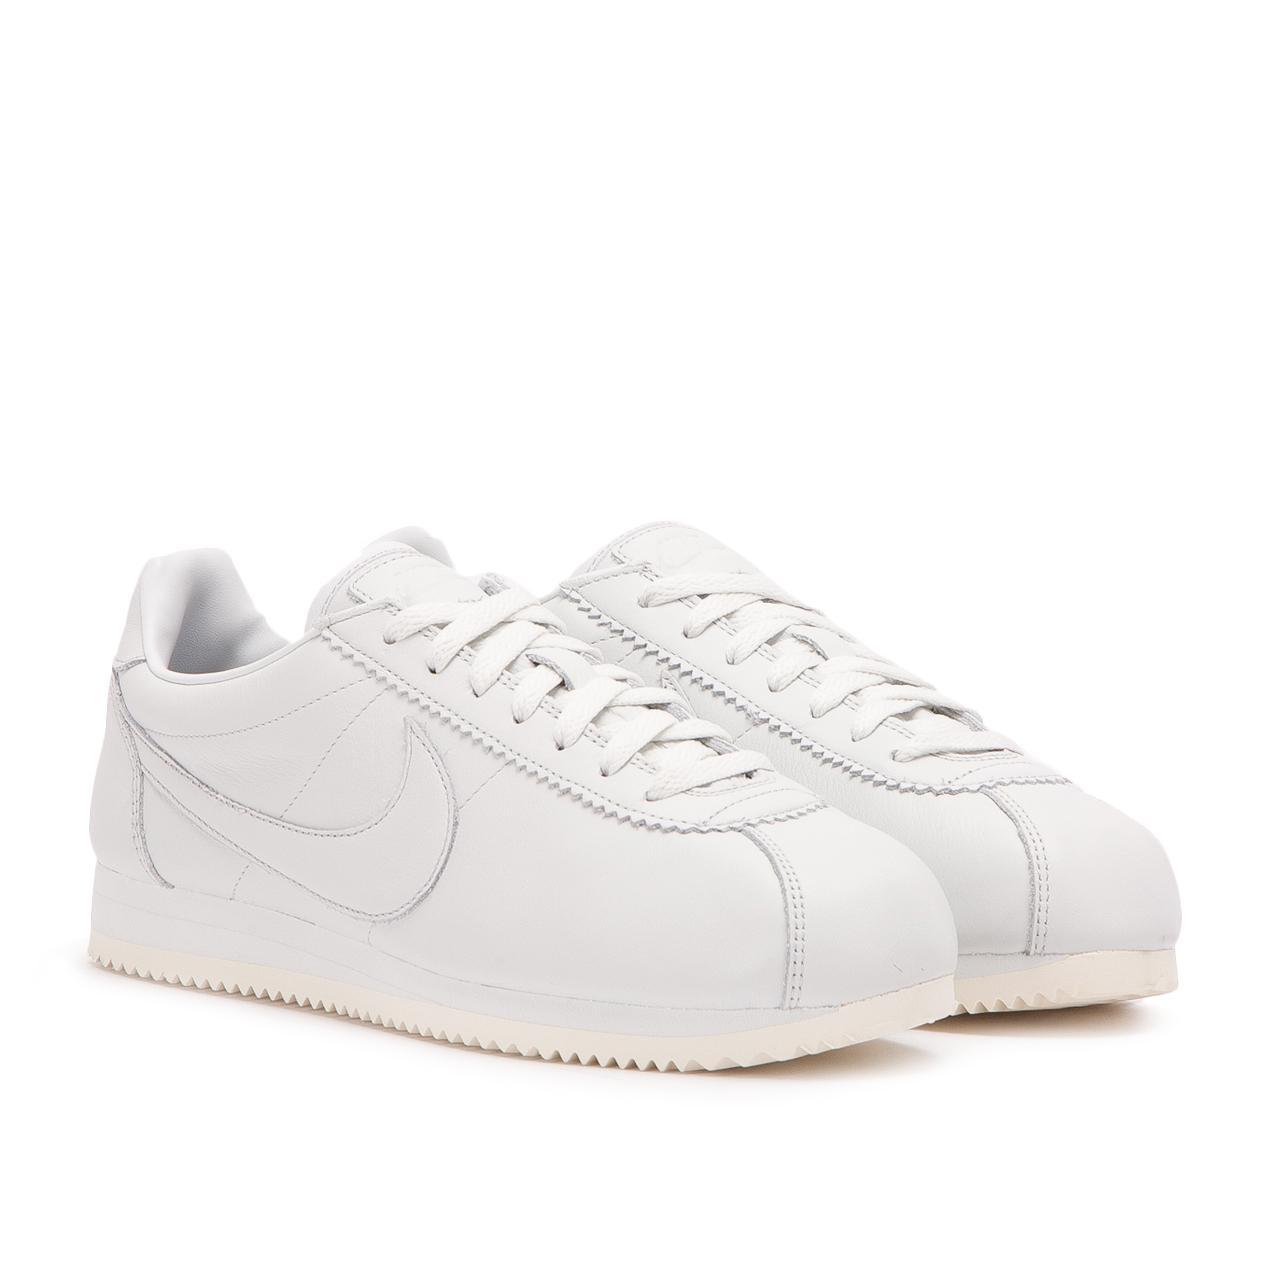 pretty nice 059fe b0342 Nike - White Nike Classic Cortez Premium for Men - Lyst. View fullscreen